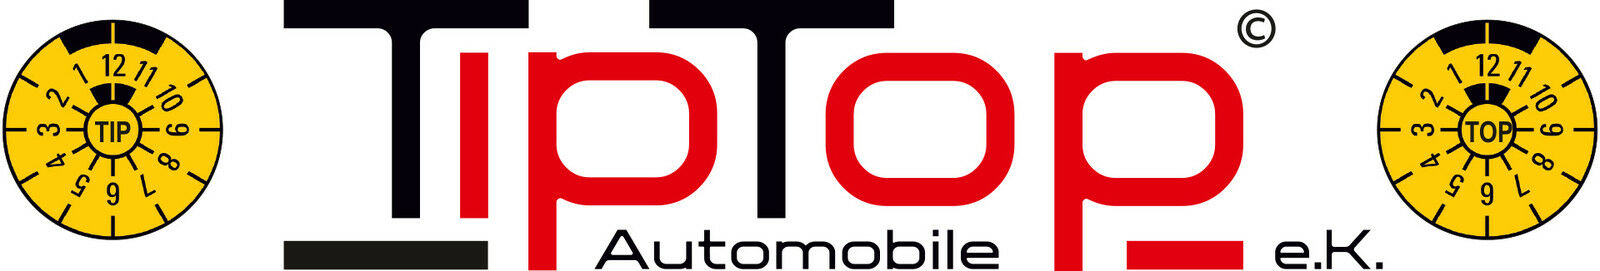 Autohaus Tip Top Automobile